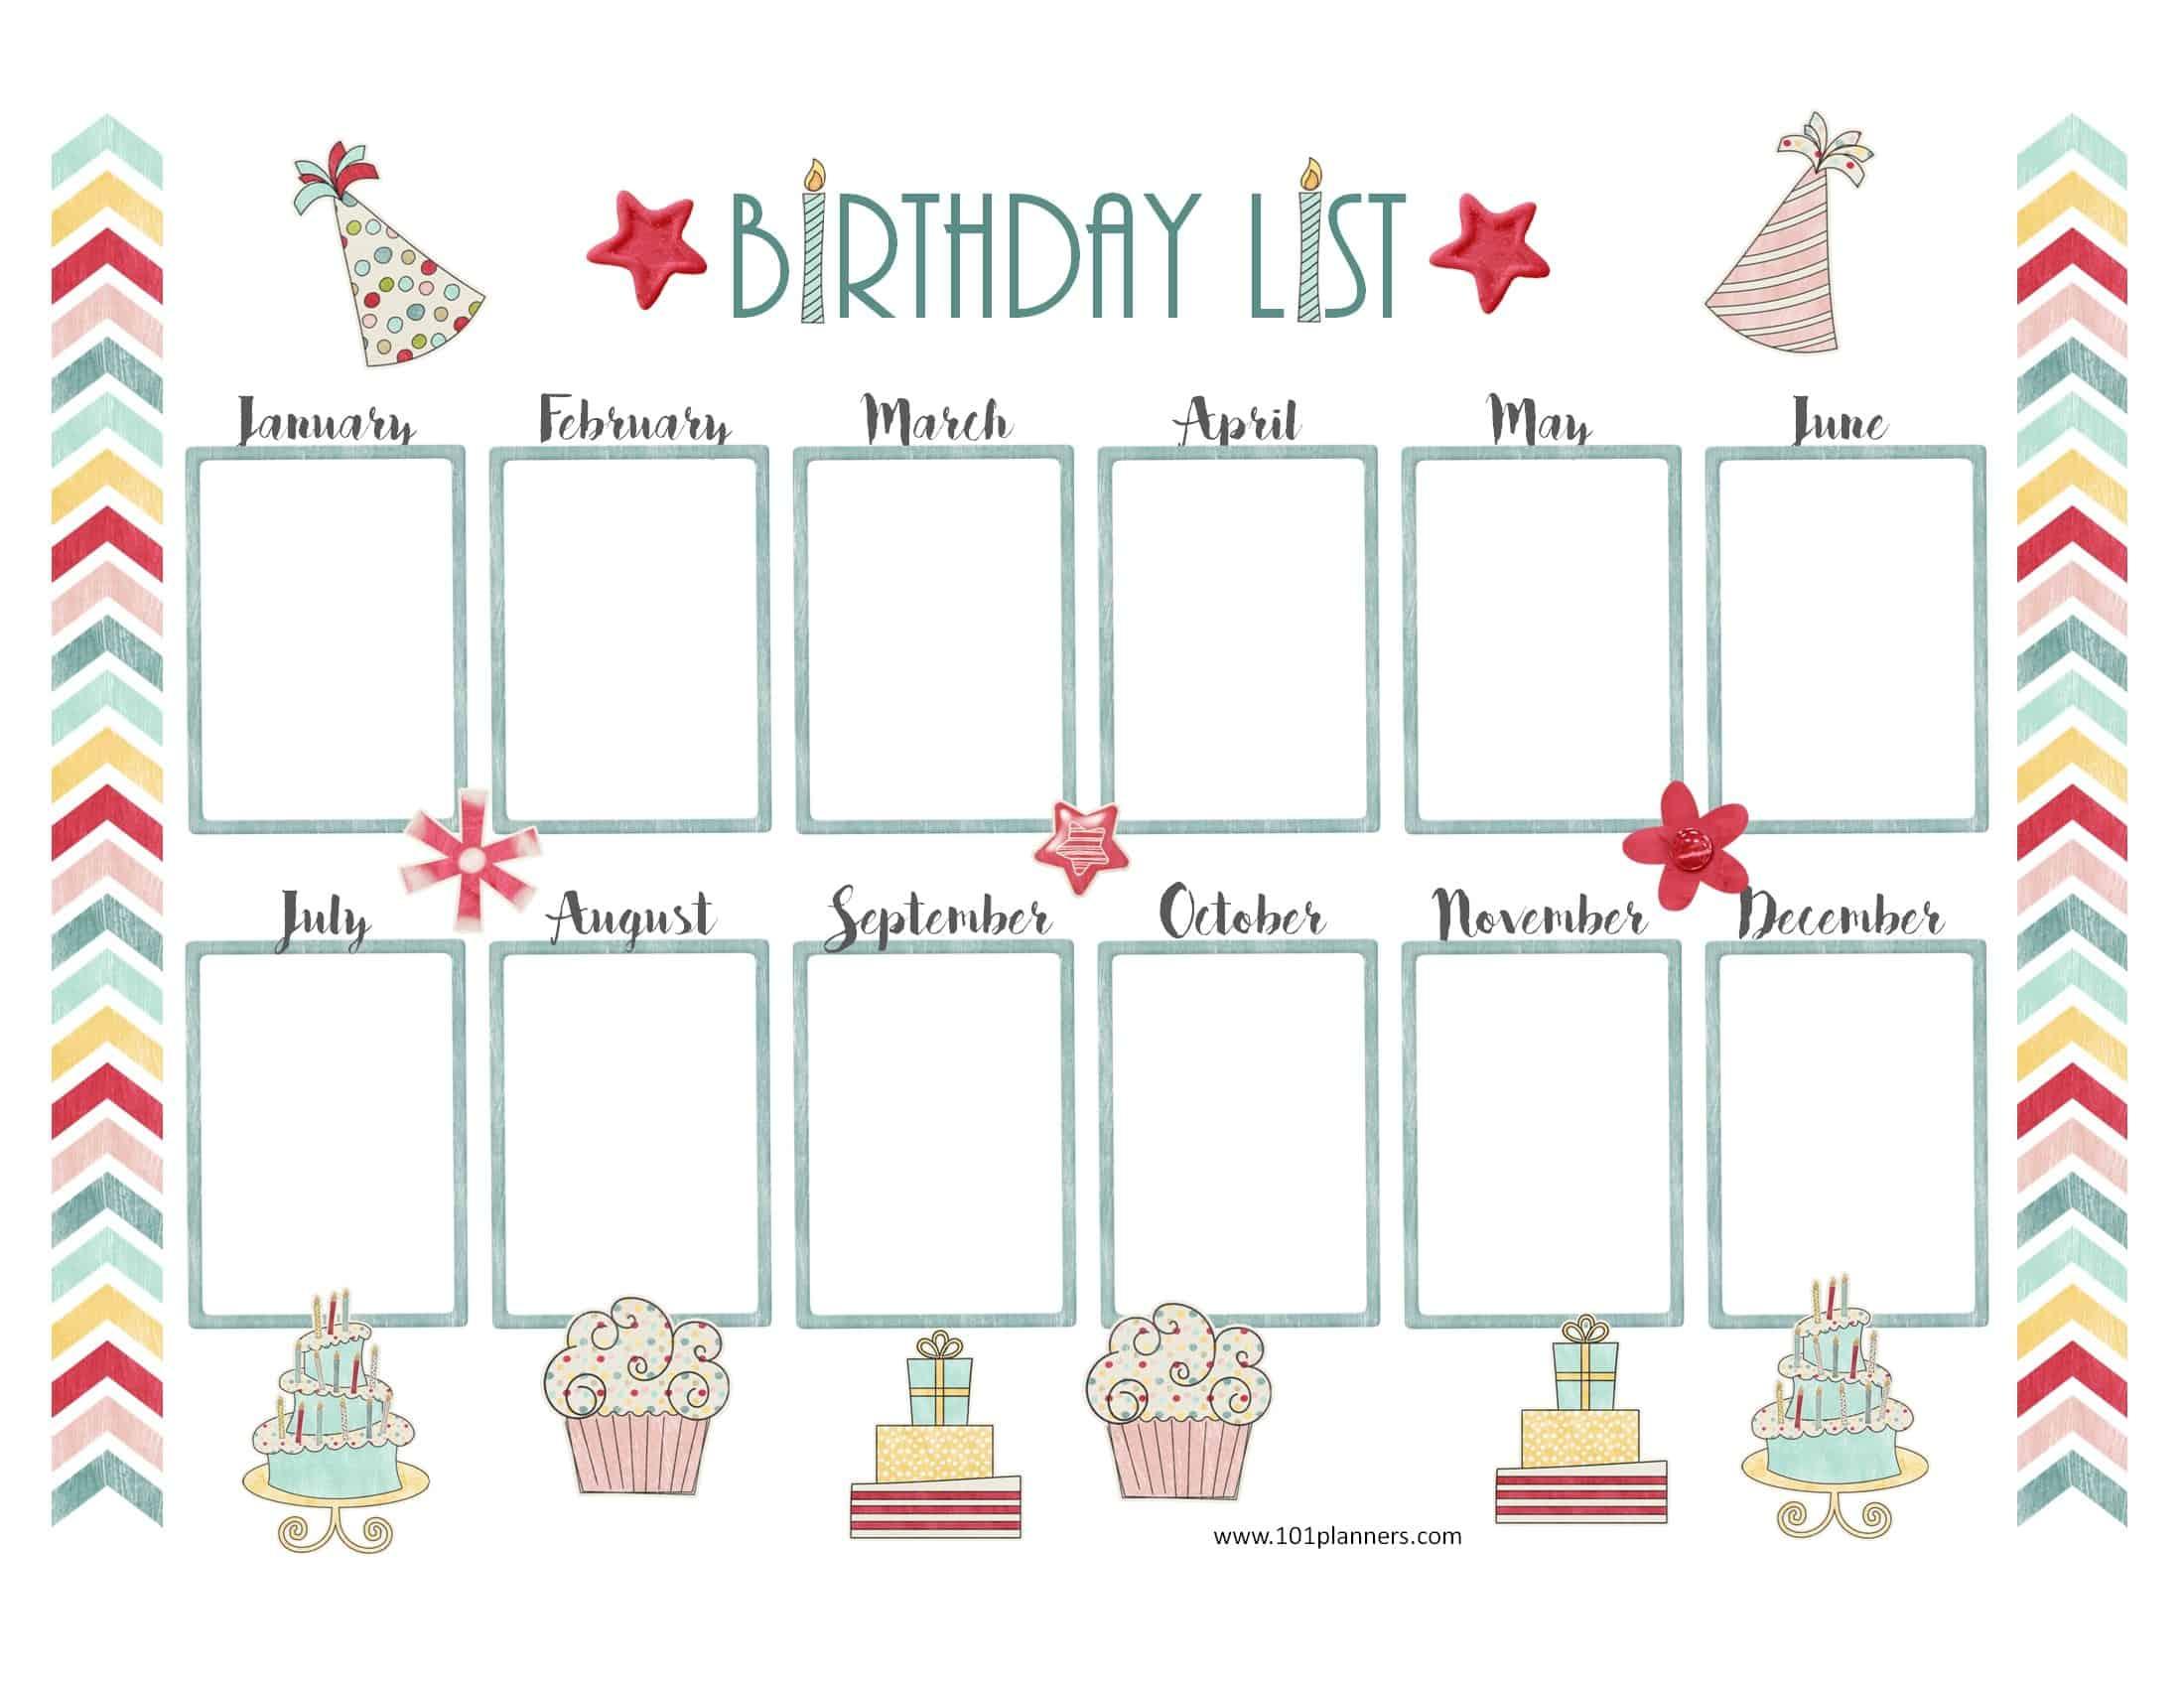 Free Birthday Calendar   Printable & Customizable   Many Designs! for Monthly Birthday Calendar Template